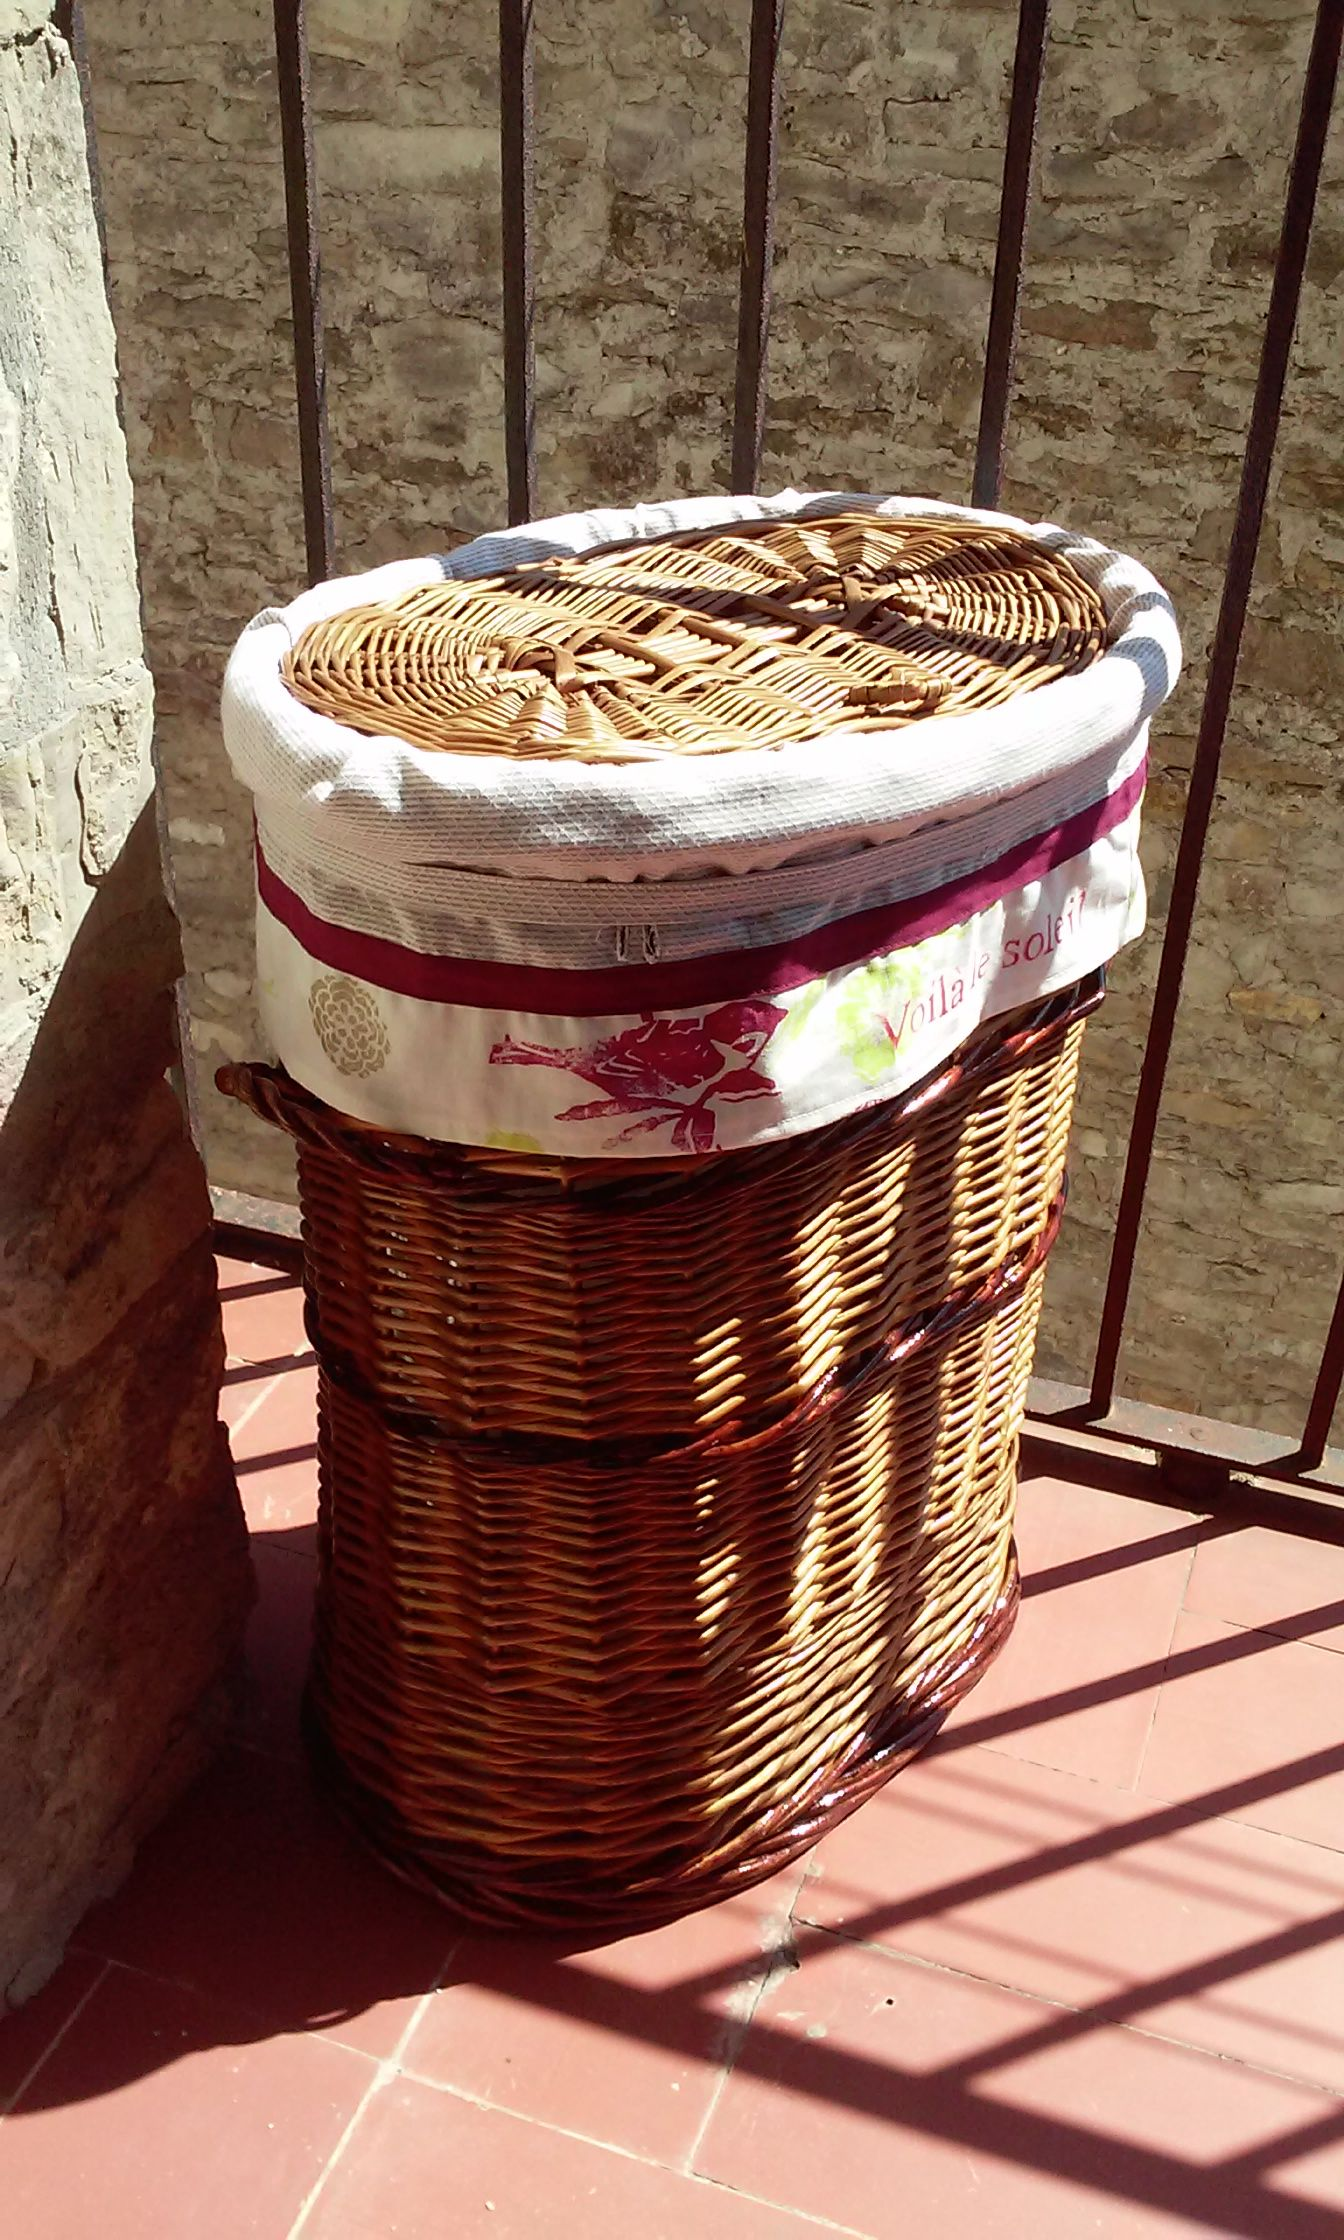 Restauraci n de una vieja cesta de mimbre para la ropa - Reciclar cestas de mimbre ...